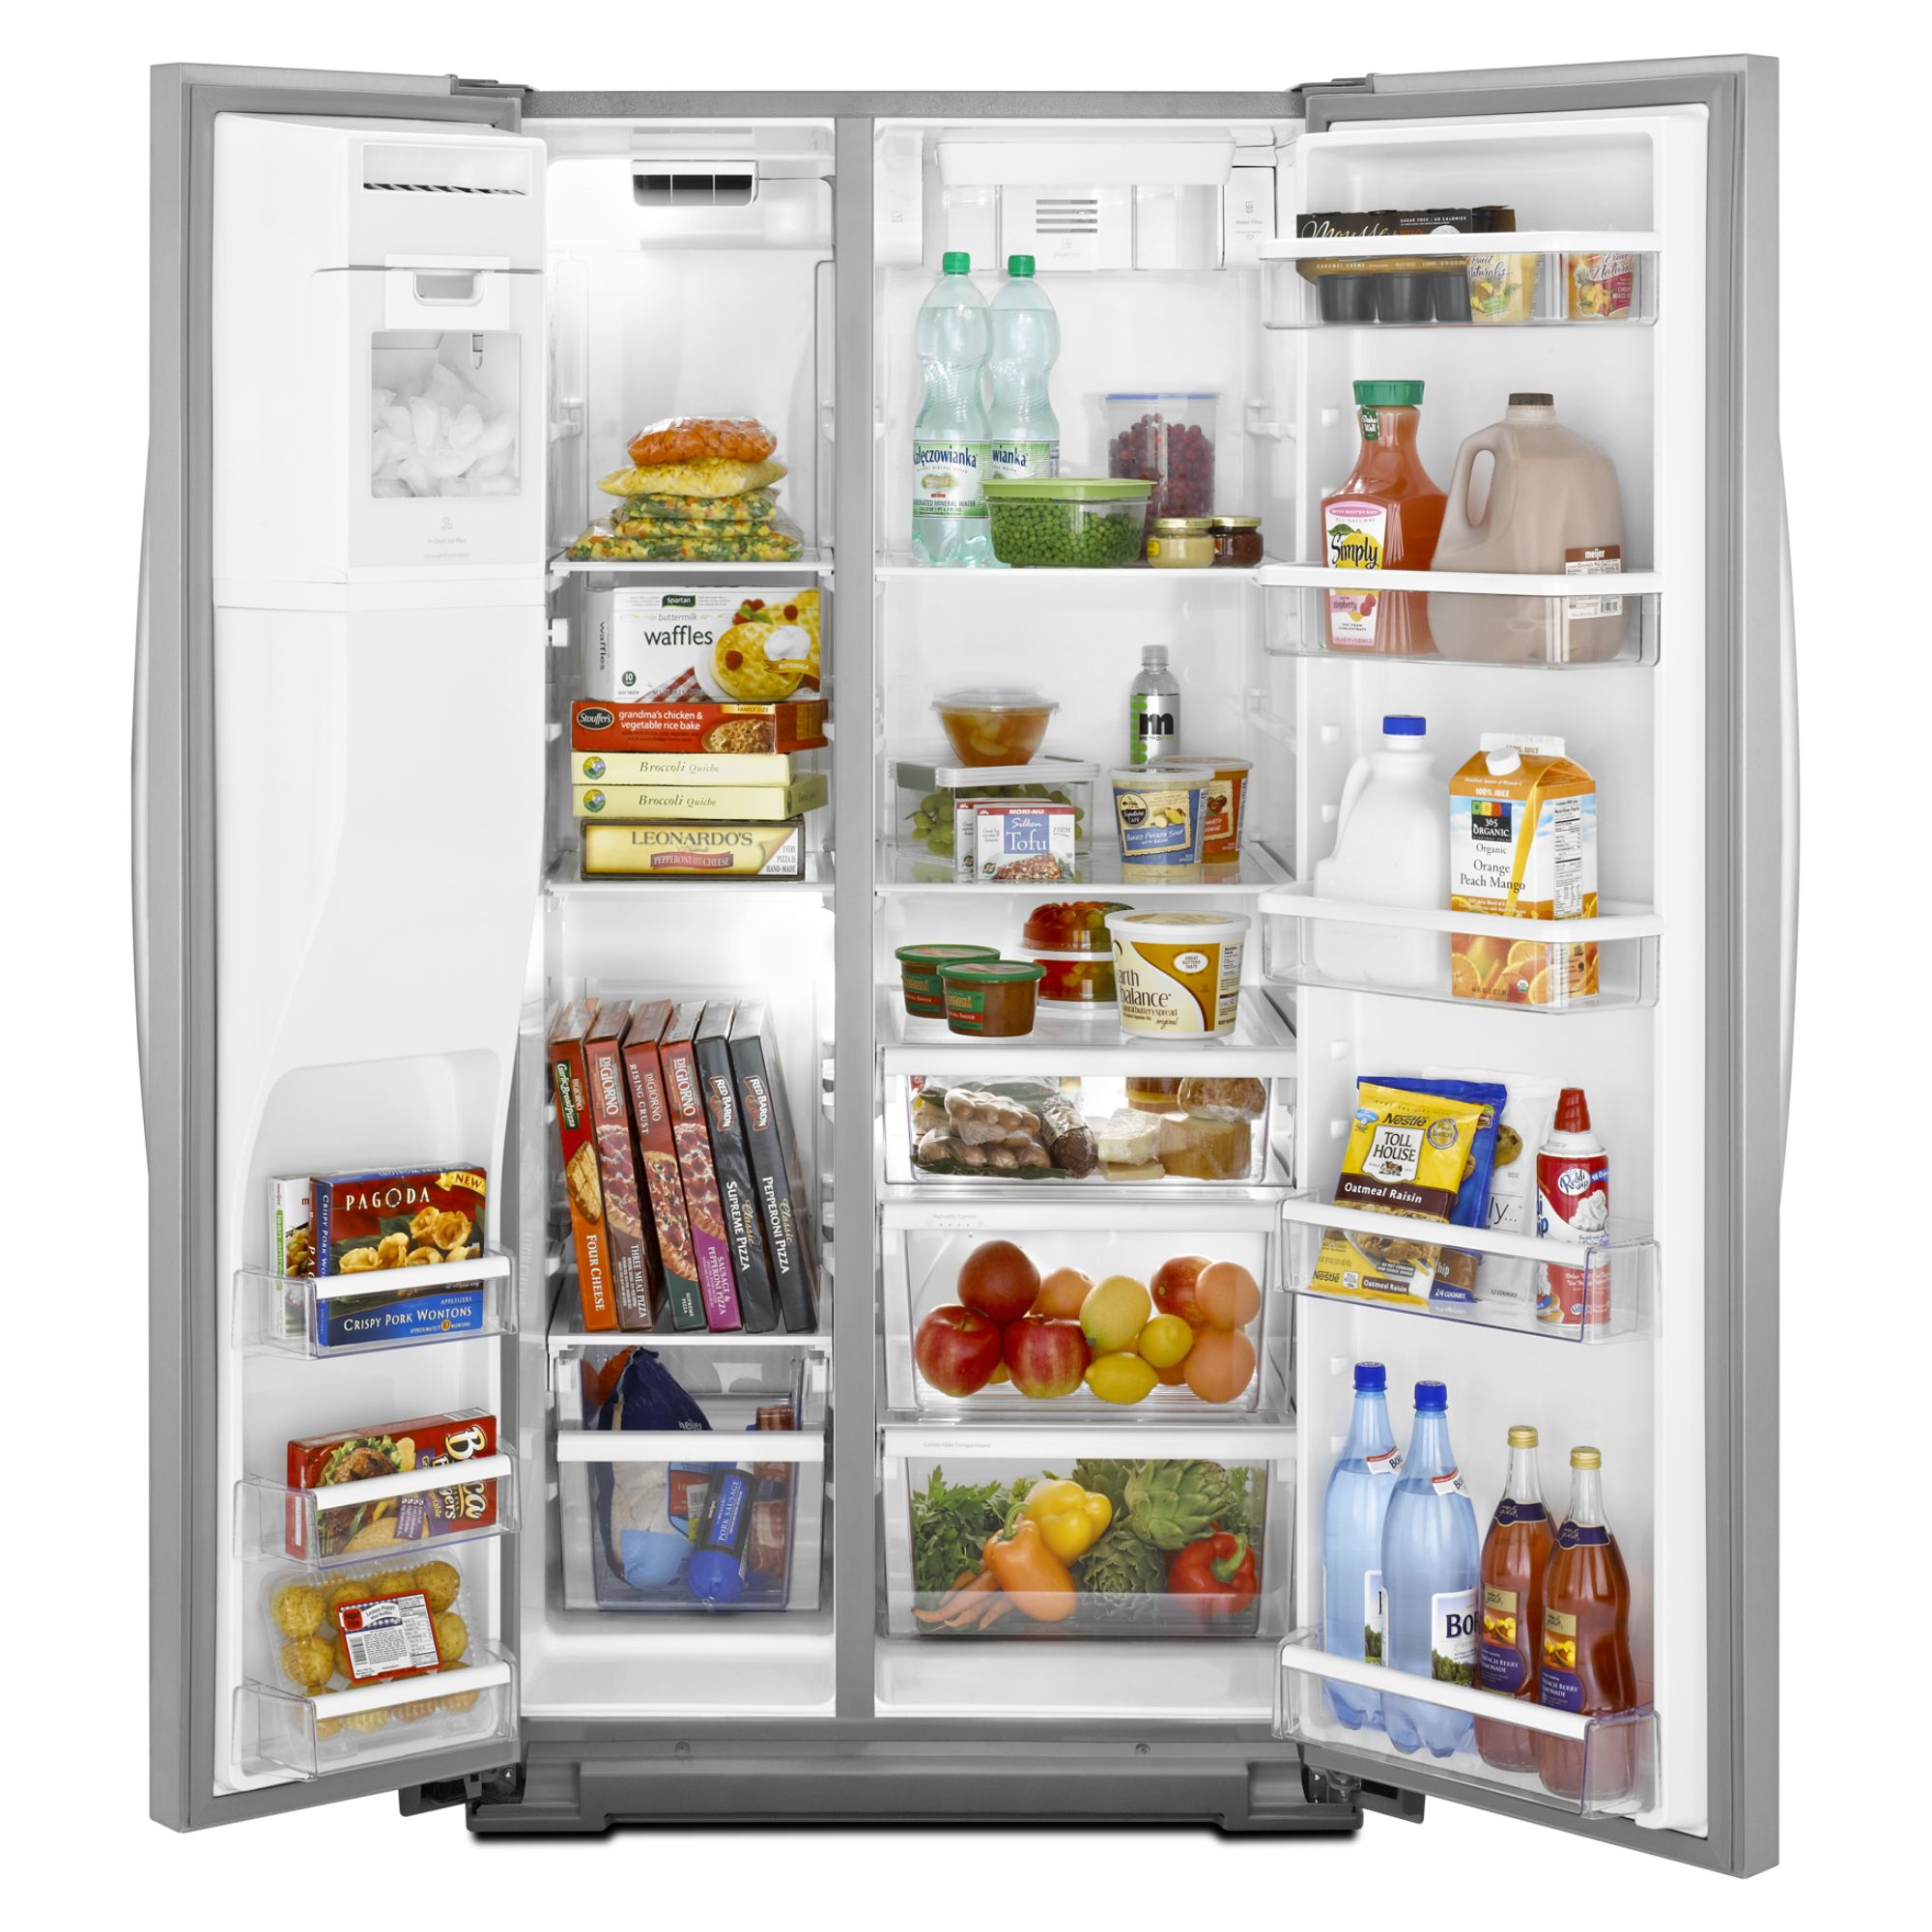 Whirlpool 26.4 cu. ft. Side-by-Side Refrigerator w/ In-Door-Ice® Plus System - Black